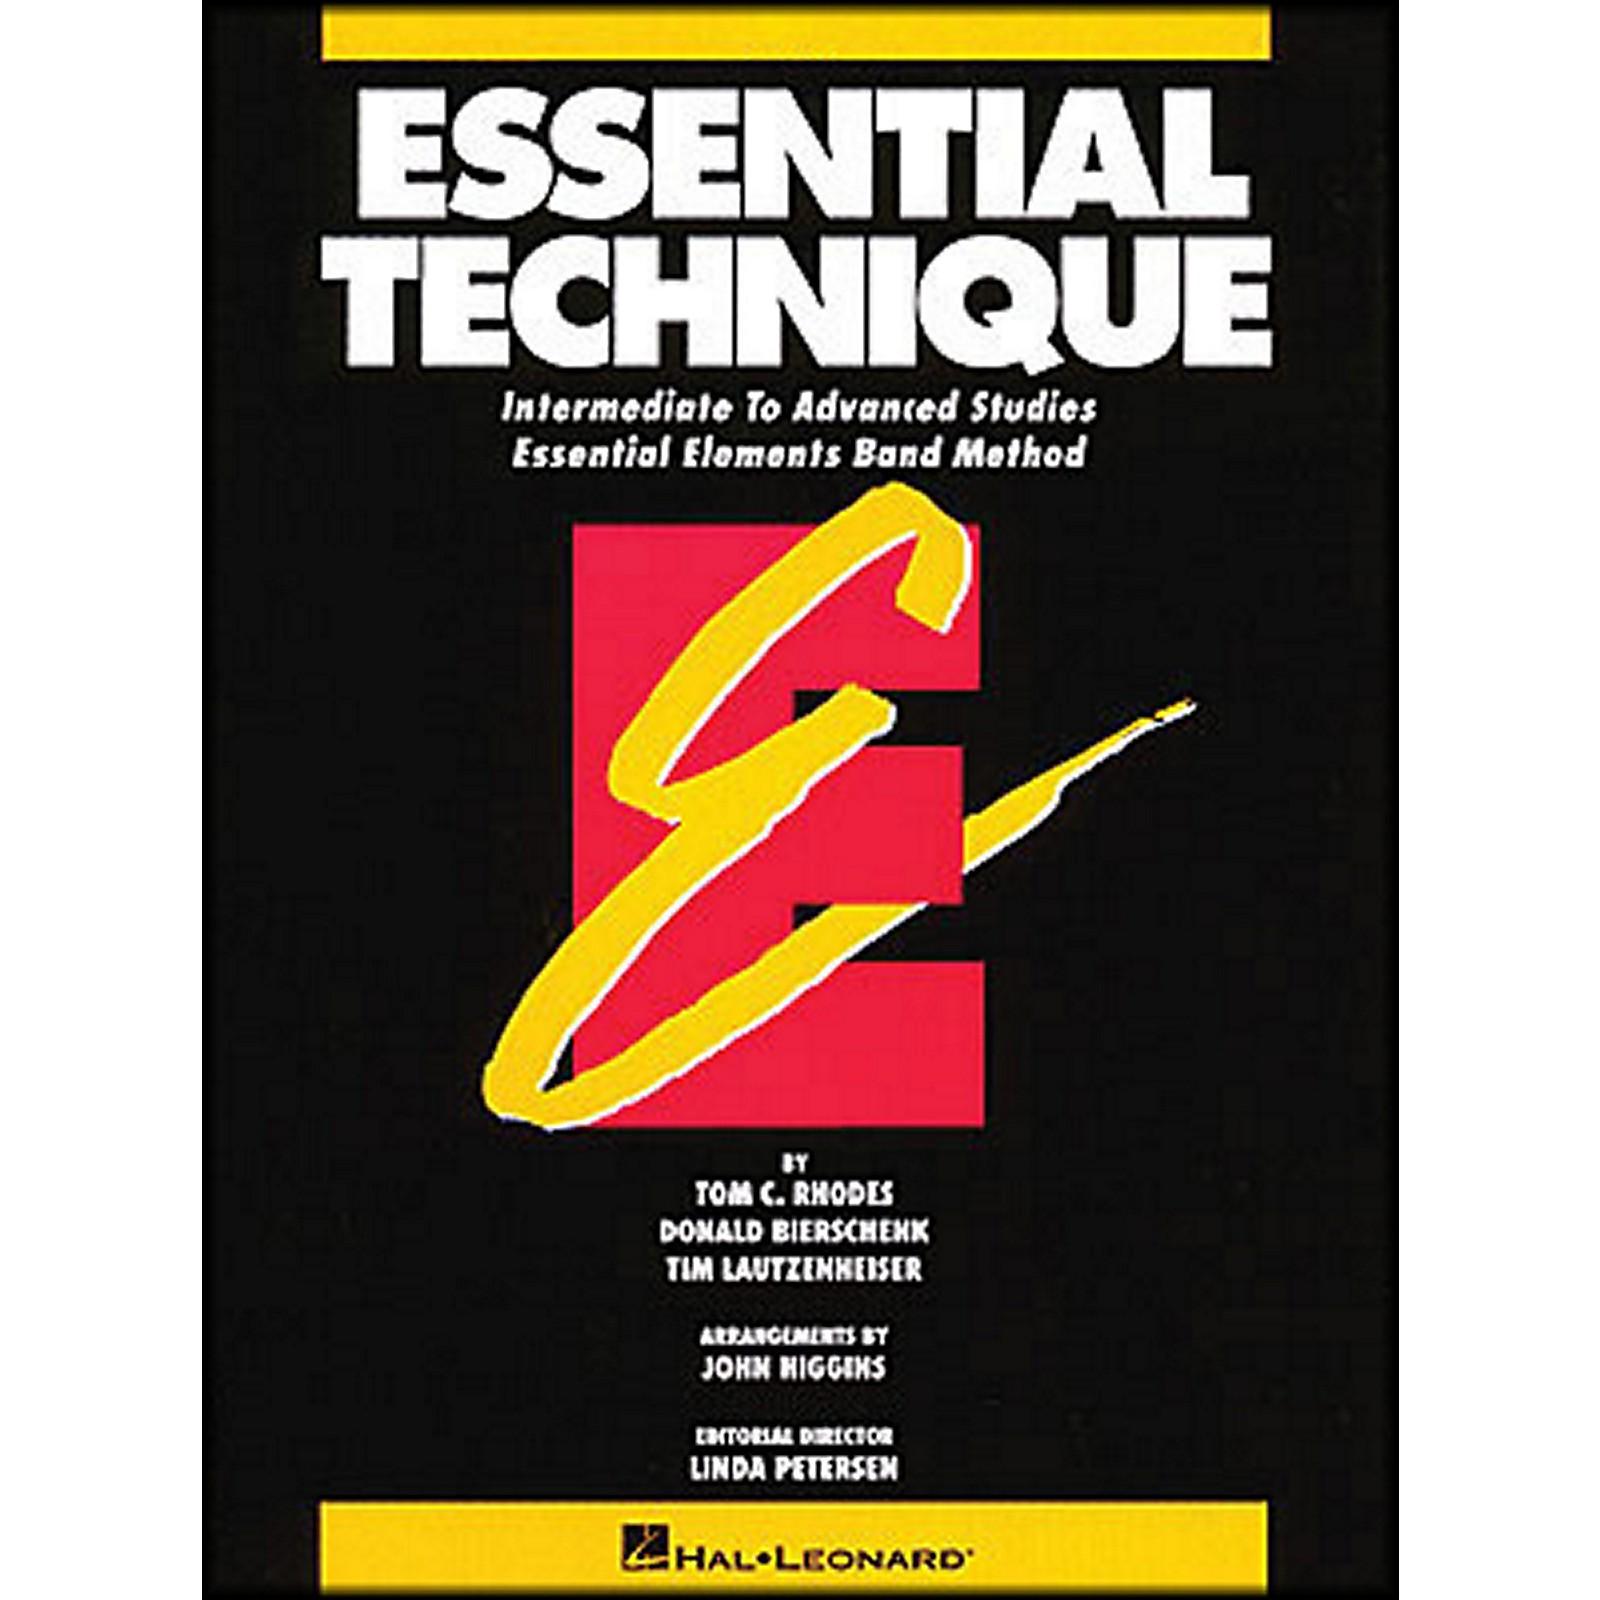 Hal Leonard Essential Technique For Baritone B.C. - Intermediate To Advanced Studies